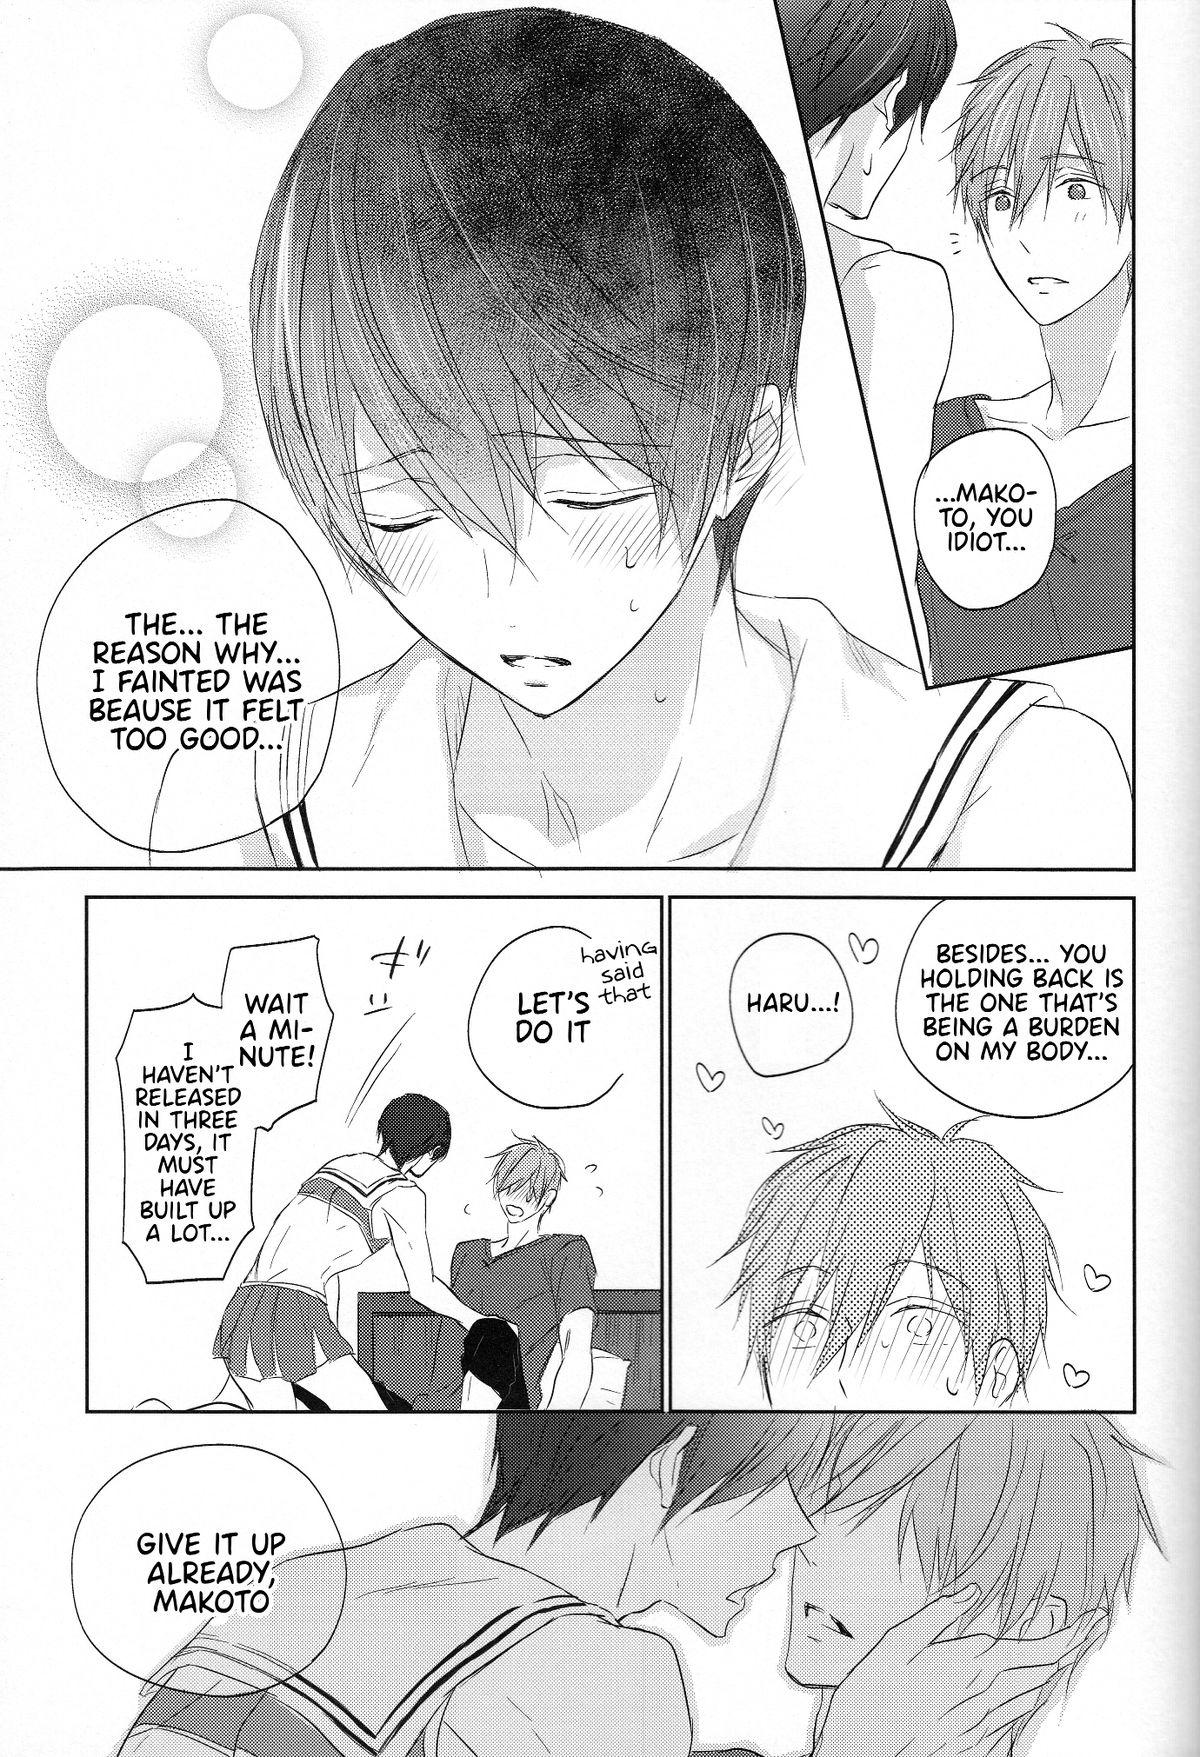 (Renai Endorphin 2) [Sneeeze (Kubu)] Cheer Haru-chan no Yuutsu | The Melancholy of Cheerleader Haru-chan (Free!) [English] {Anneioux} 11